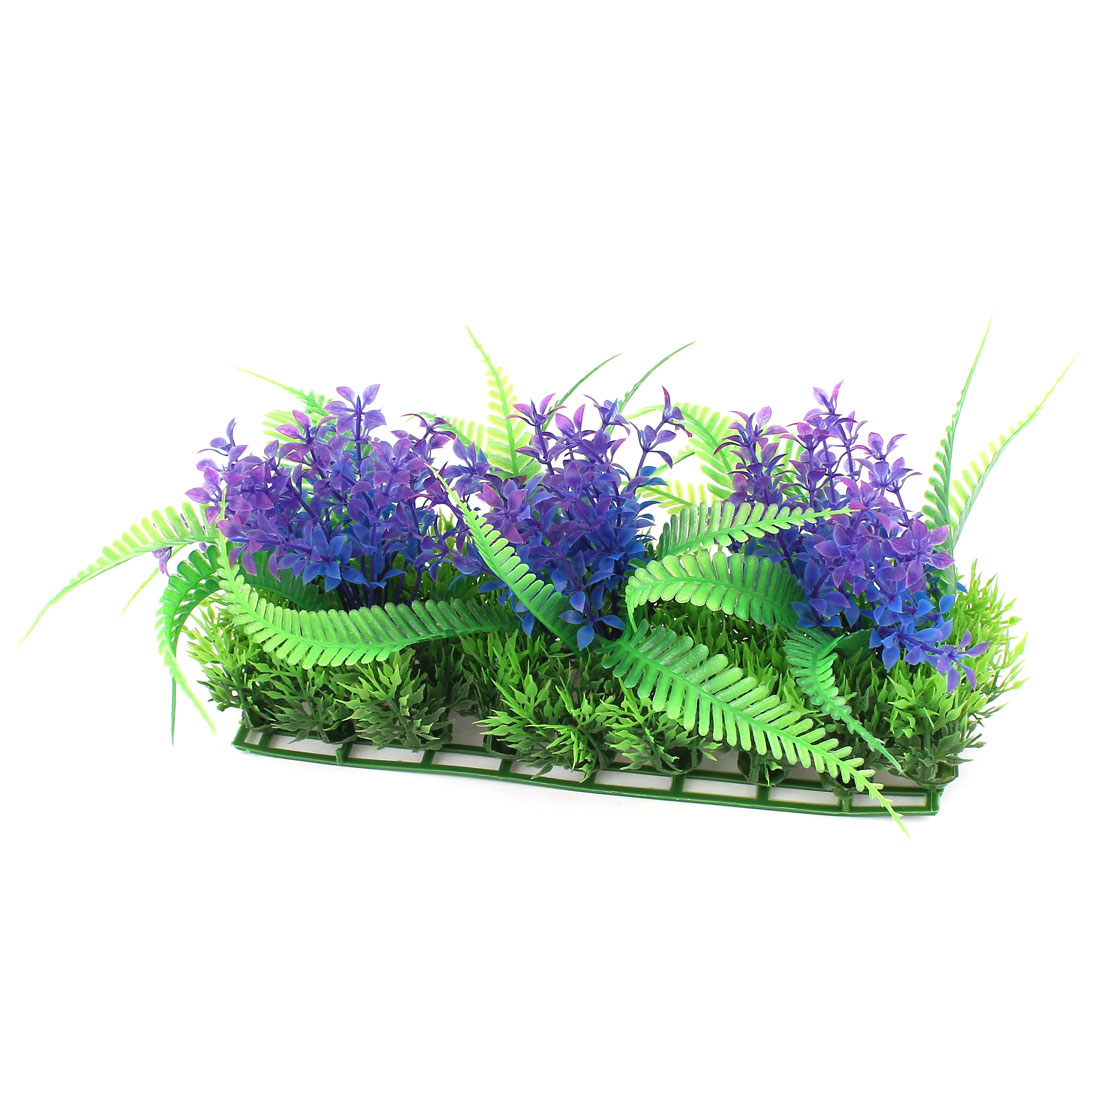 "Rectangle Base Plastic Emulational Aquarium Decoration 9.8"" Plant Grass Green Purple"